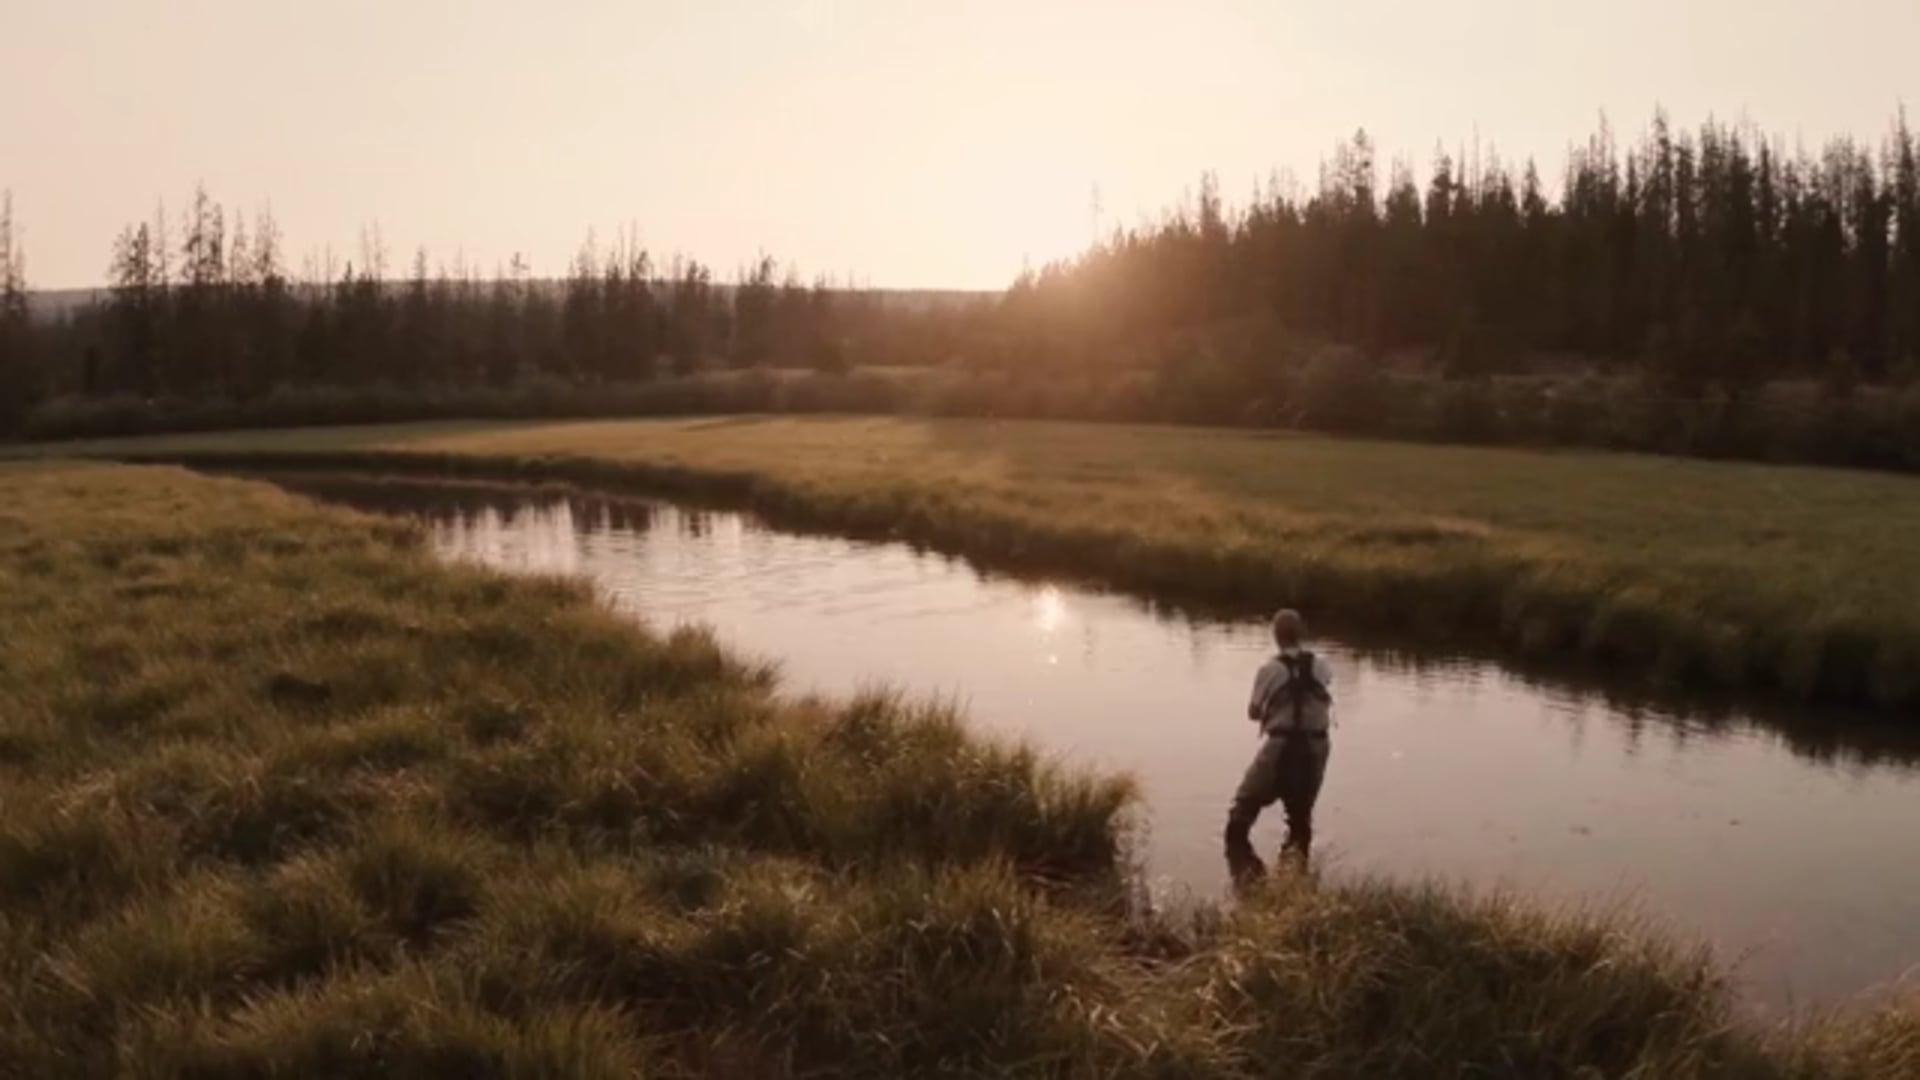 Twede Films - Featured Work